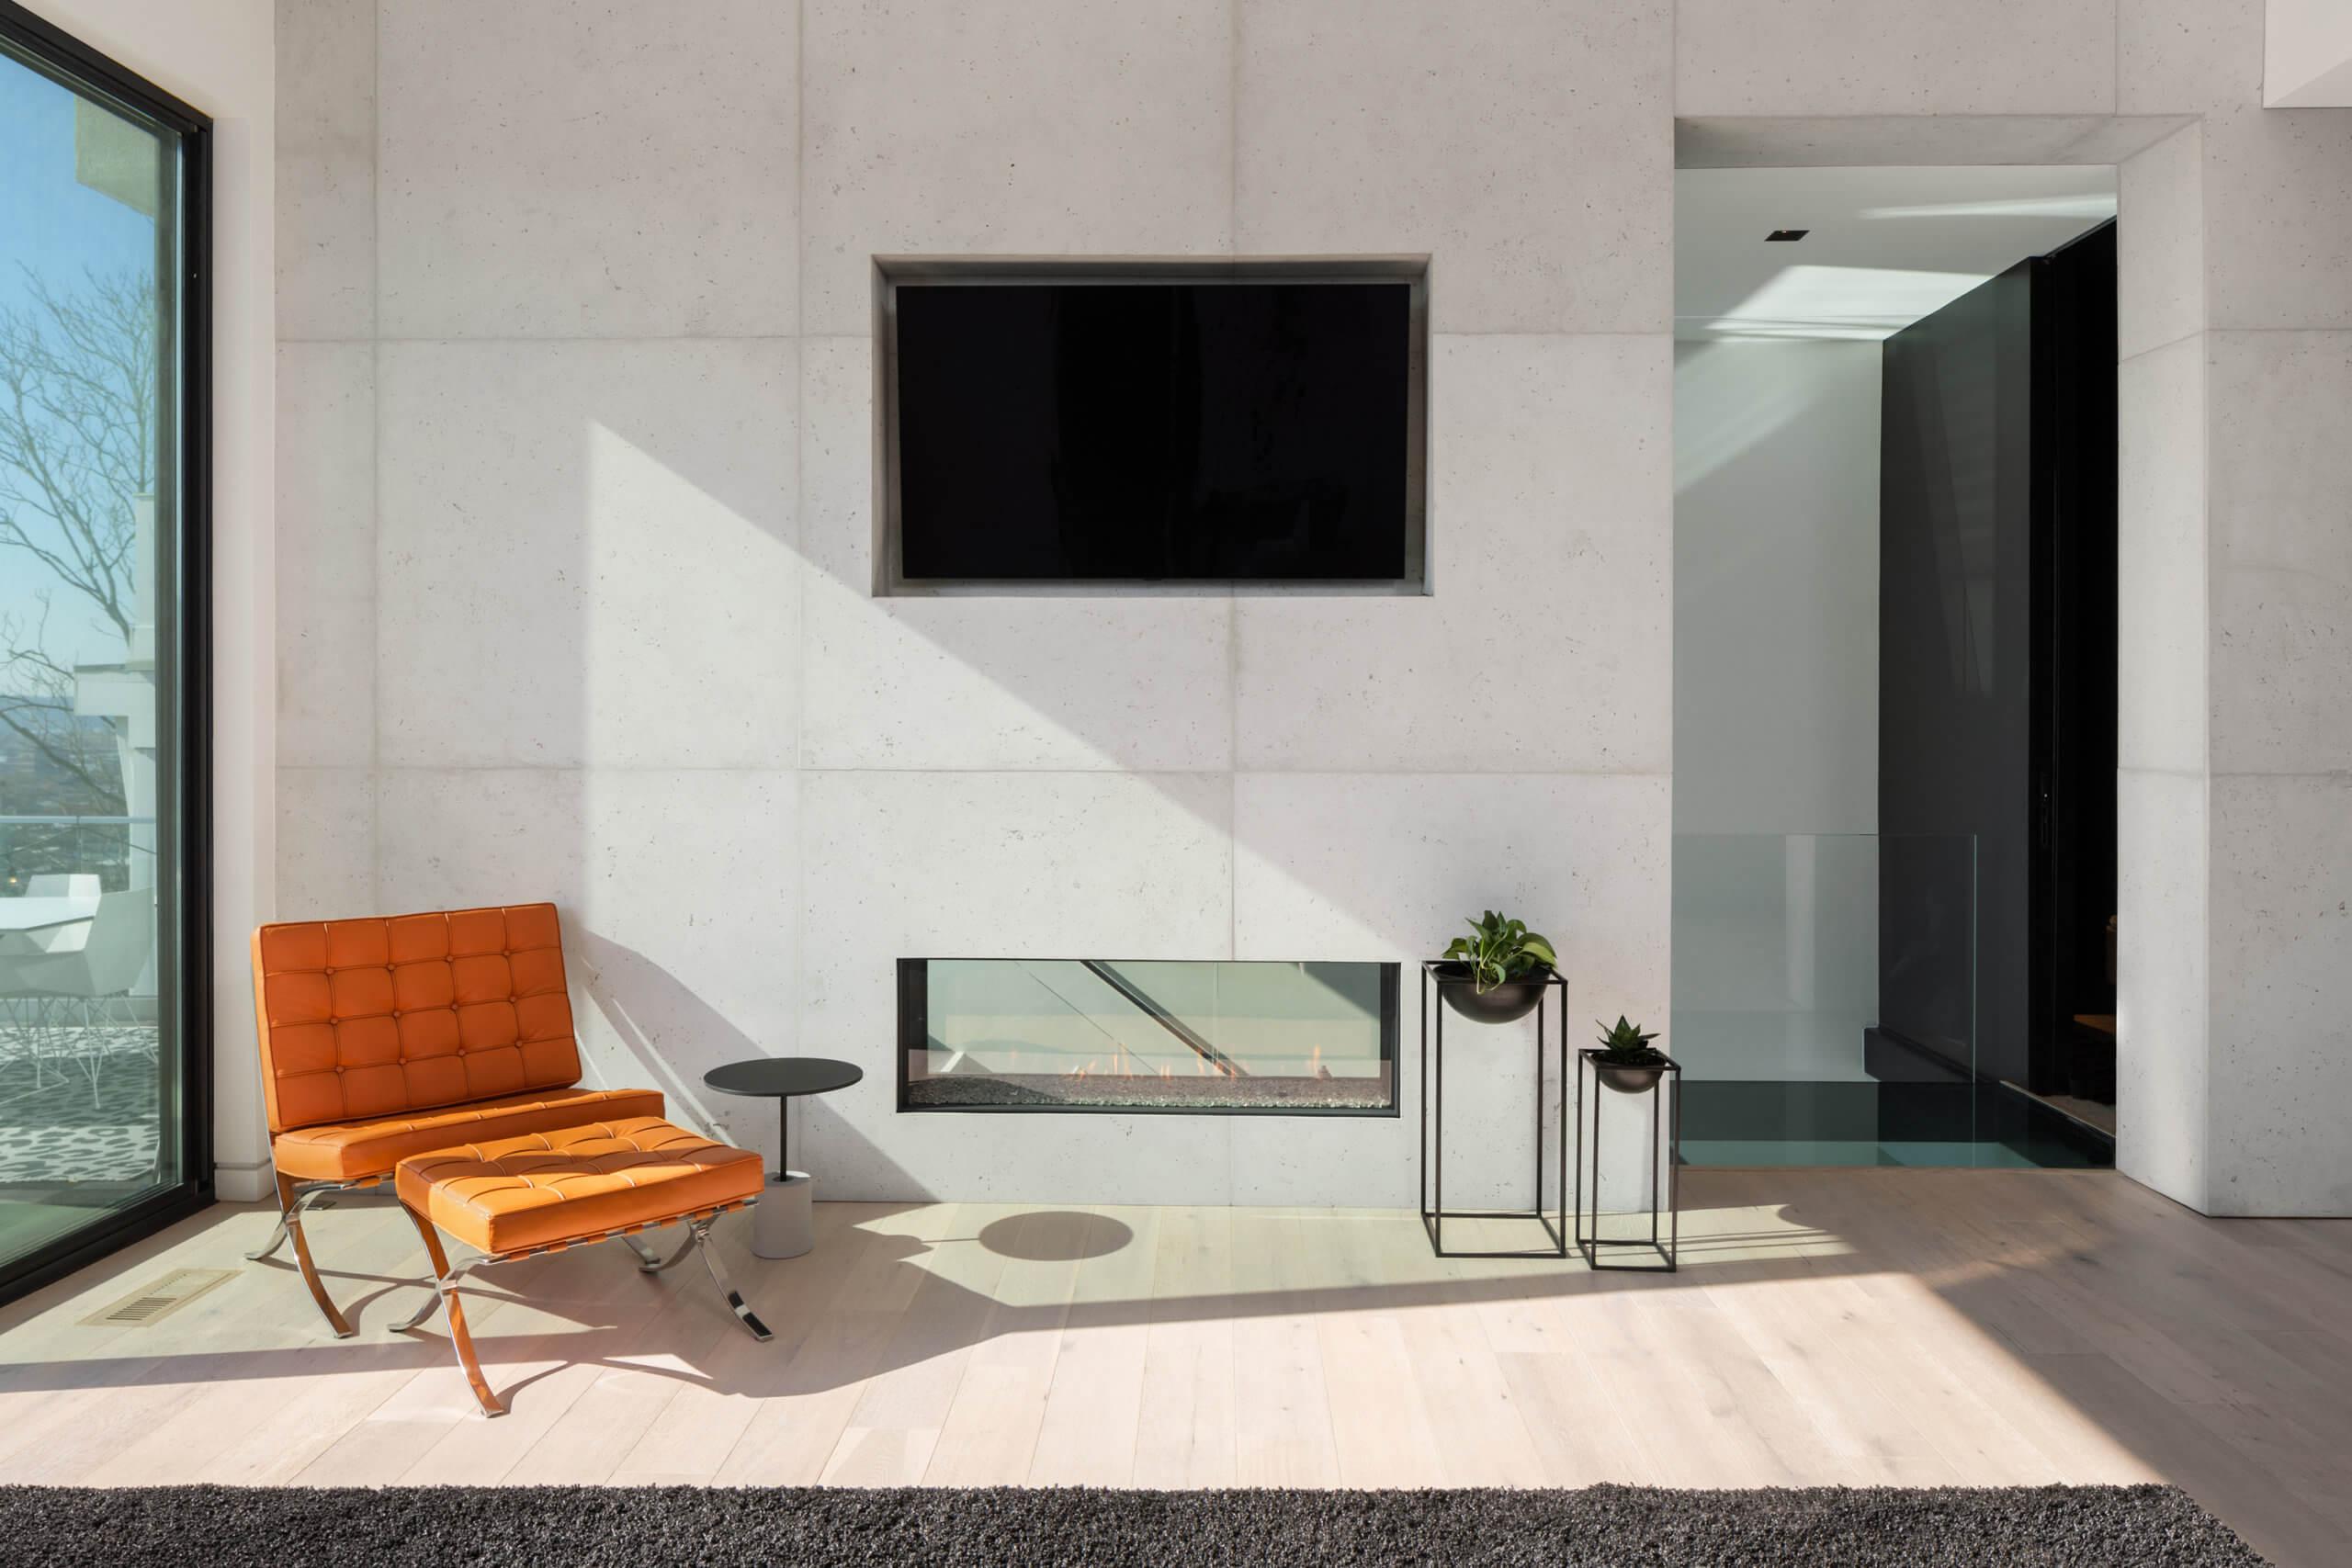 Modern tile fireplace by Interior Designer RM Interiors in Cincinnati, Ohio